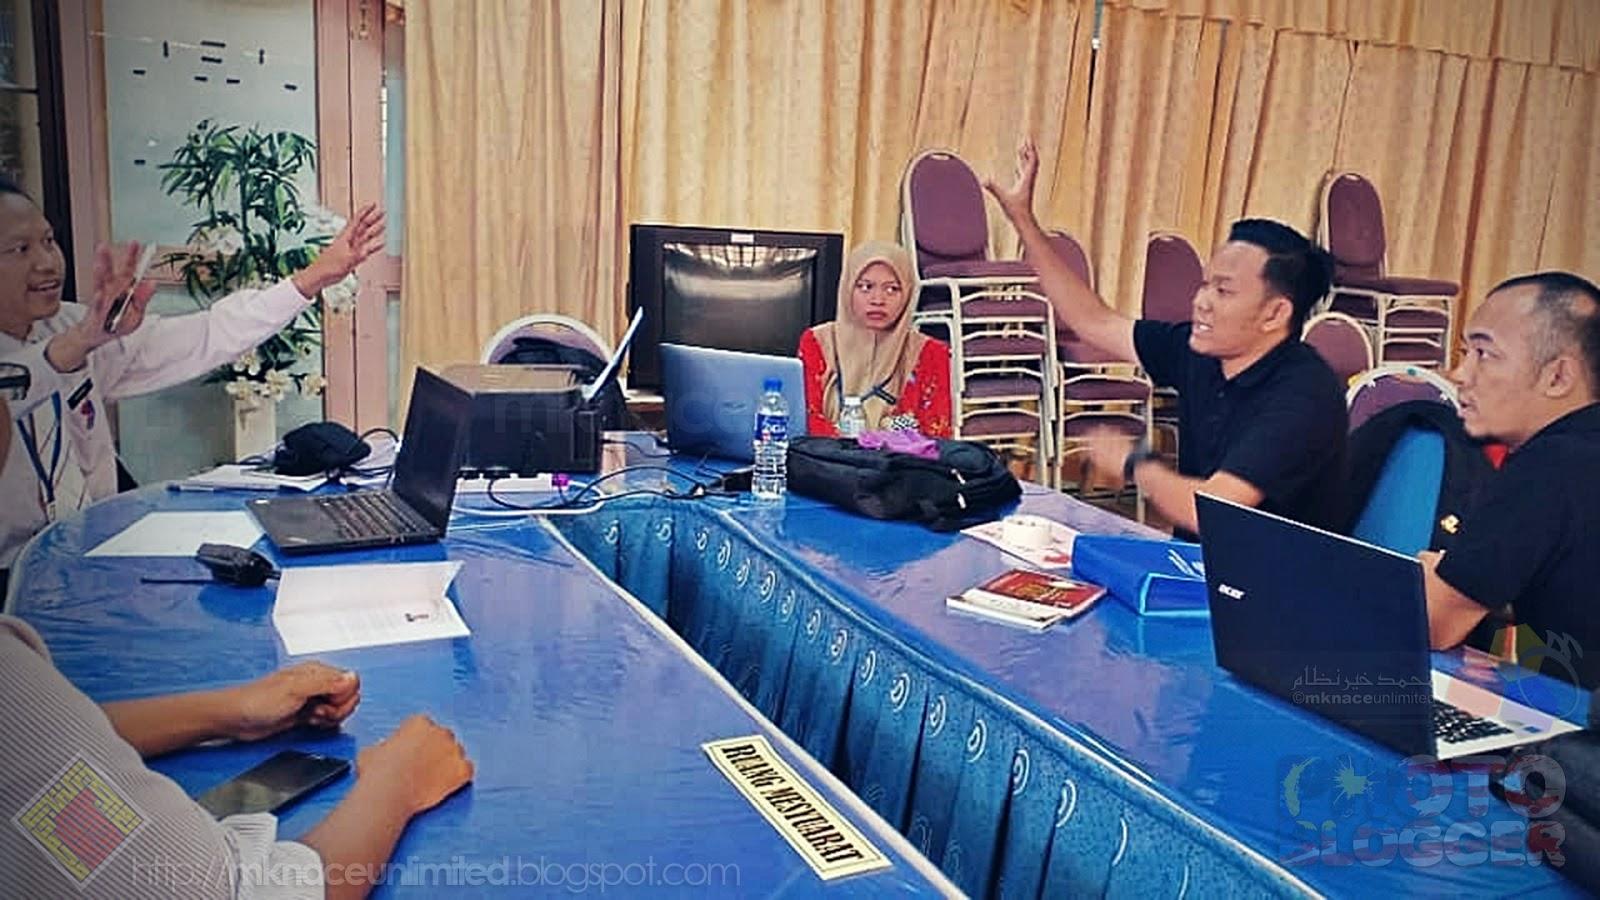 Kolokium Amalan Terbaik Pgb Immersion Peringkat Kebangsaan 2018 Tcash Vaganza 32 Milo Malaysia Activ Go Perbincangan Flow Kerja Untuk Majlis Penutup